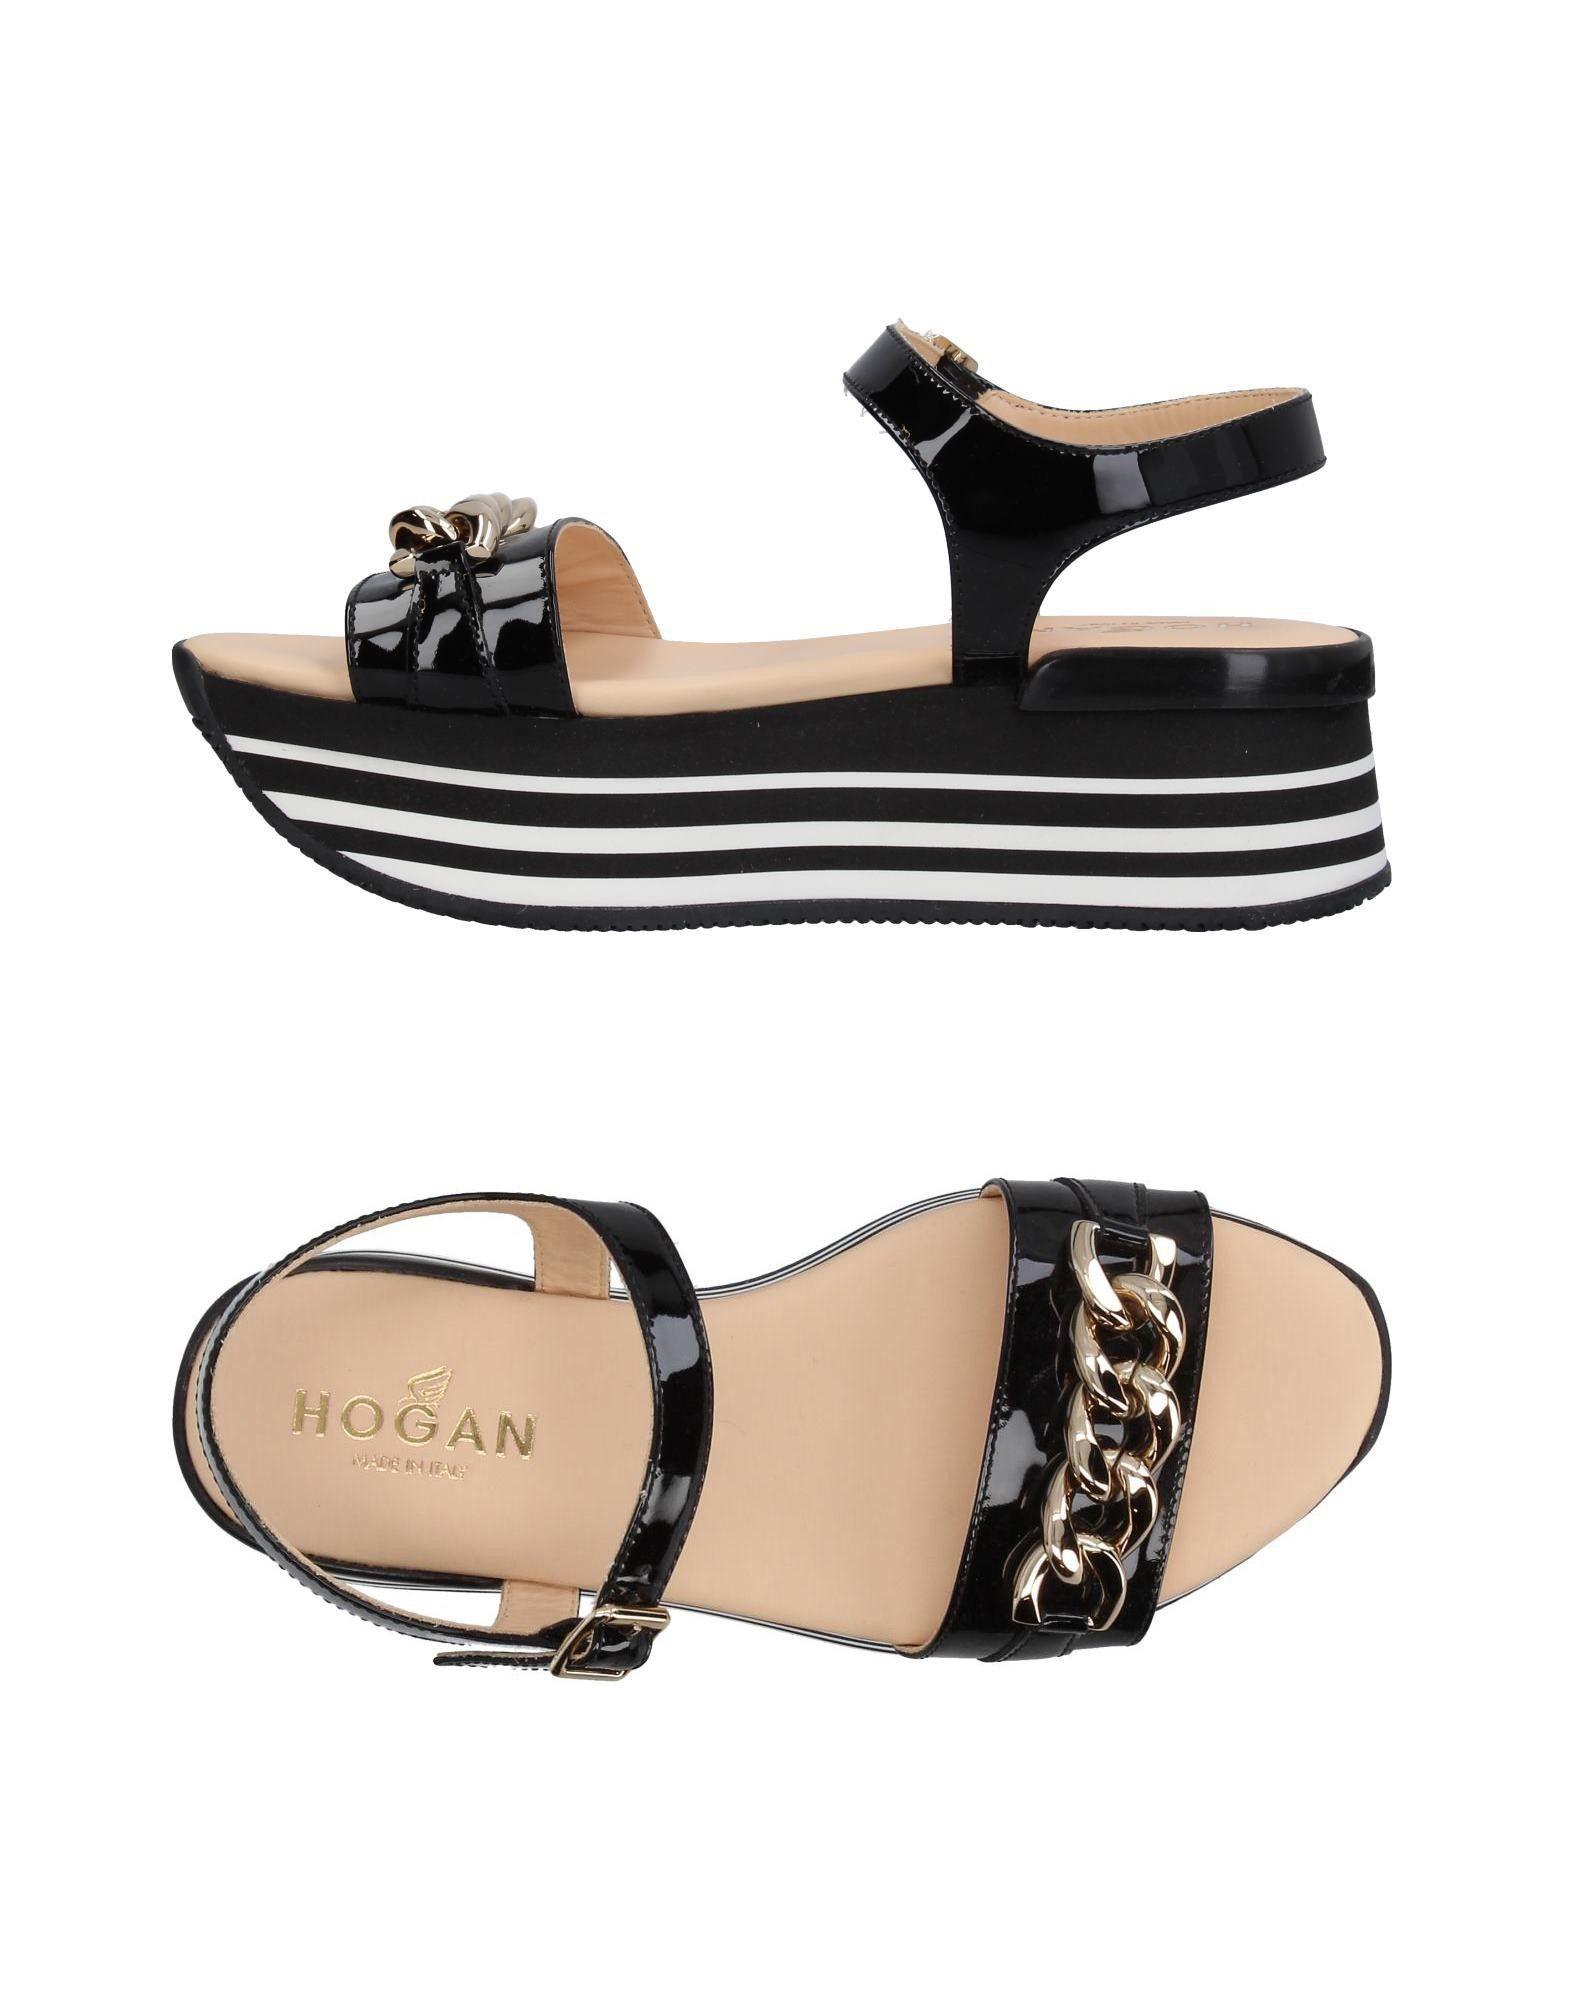 Hogan Sandals - Women Hogan Sandals online - on  United Kingdom - online 11392675LT 3974cd